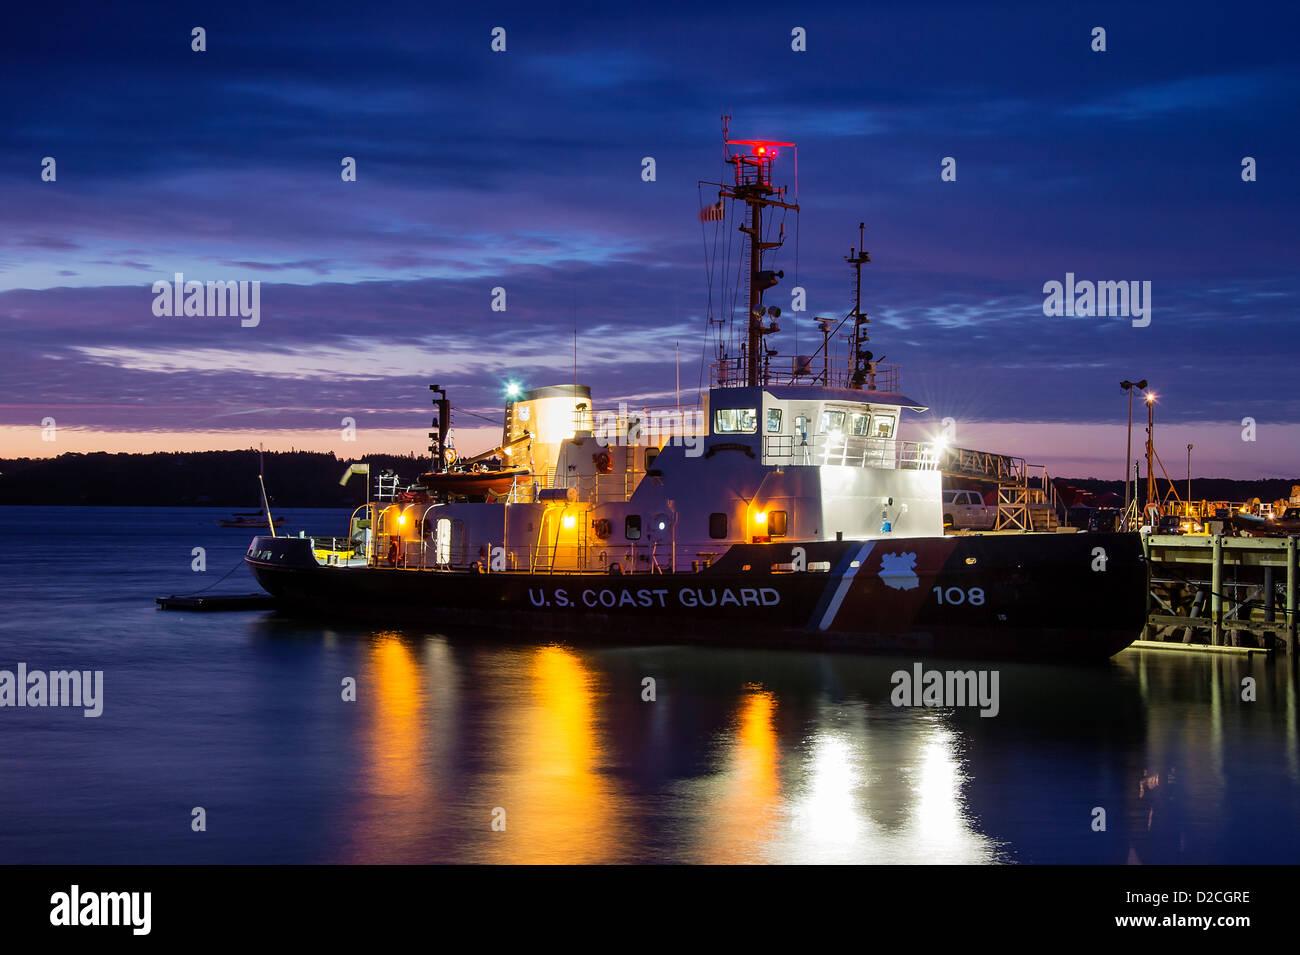 US Coast Gaurd cutter, Rockland, Maine, USA - Stock Image